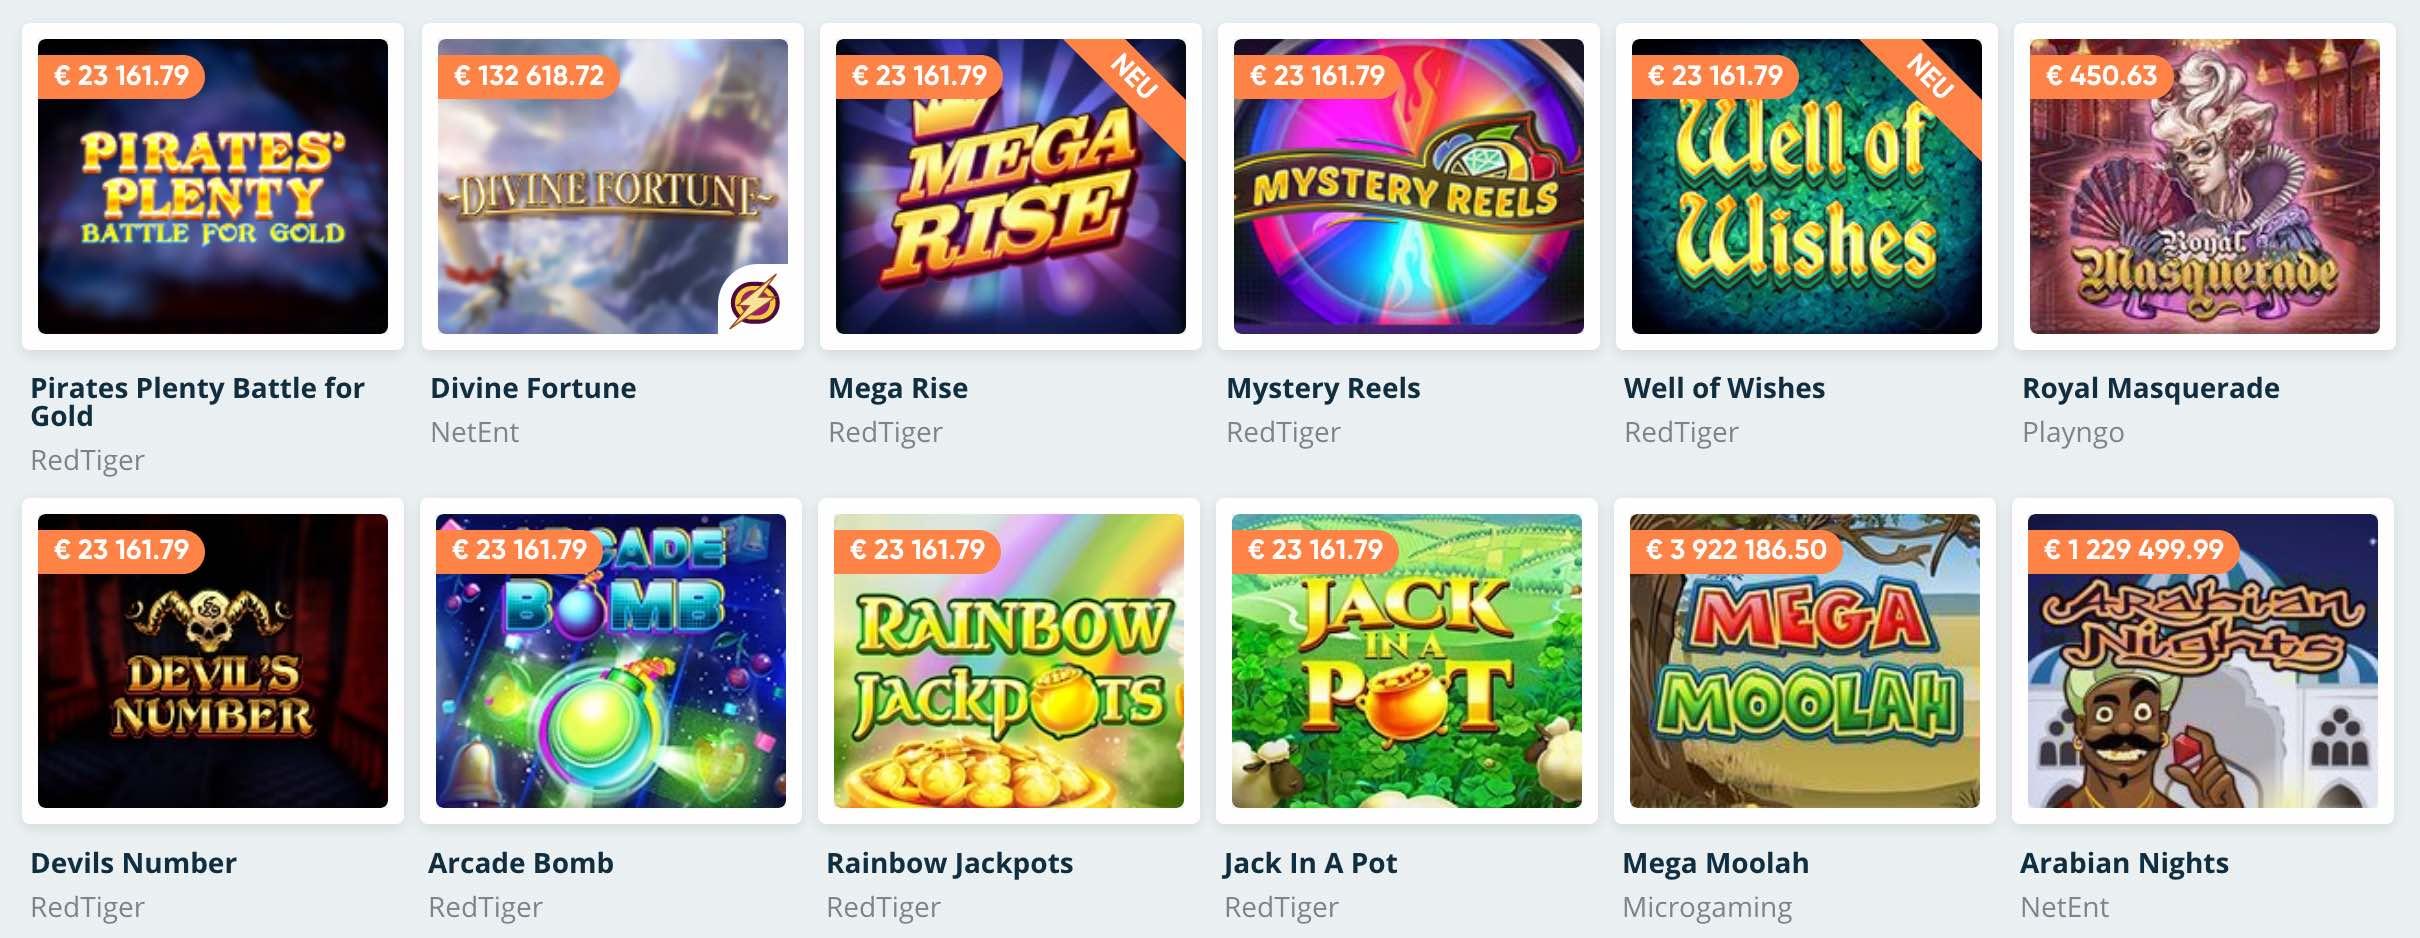 Progressive Jackpot Spiele im Speedy Casino